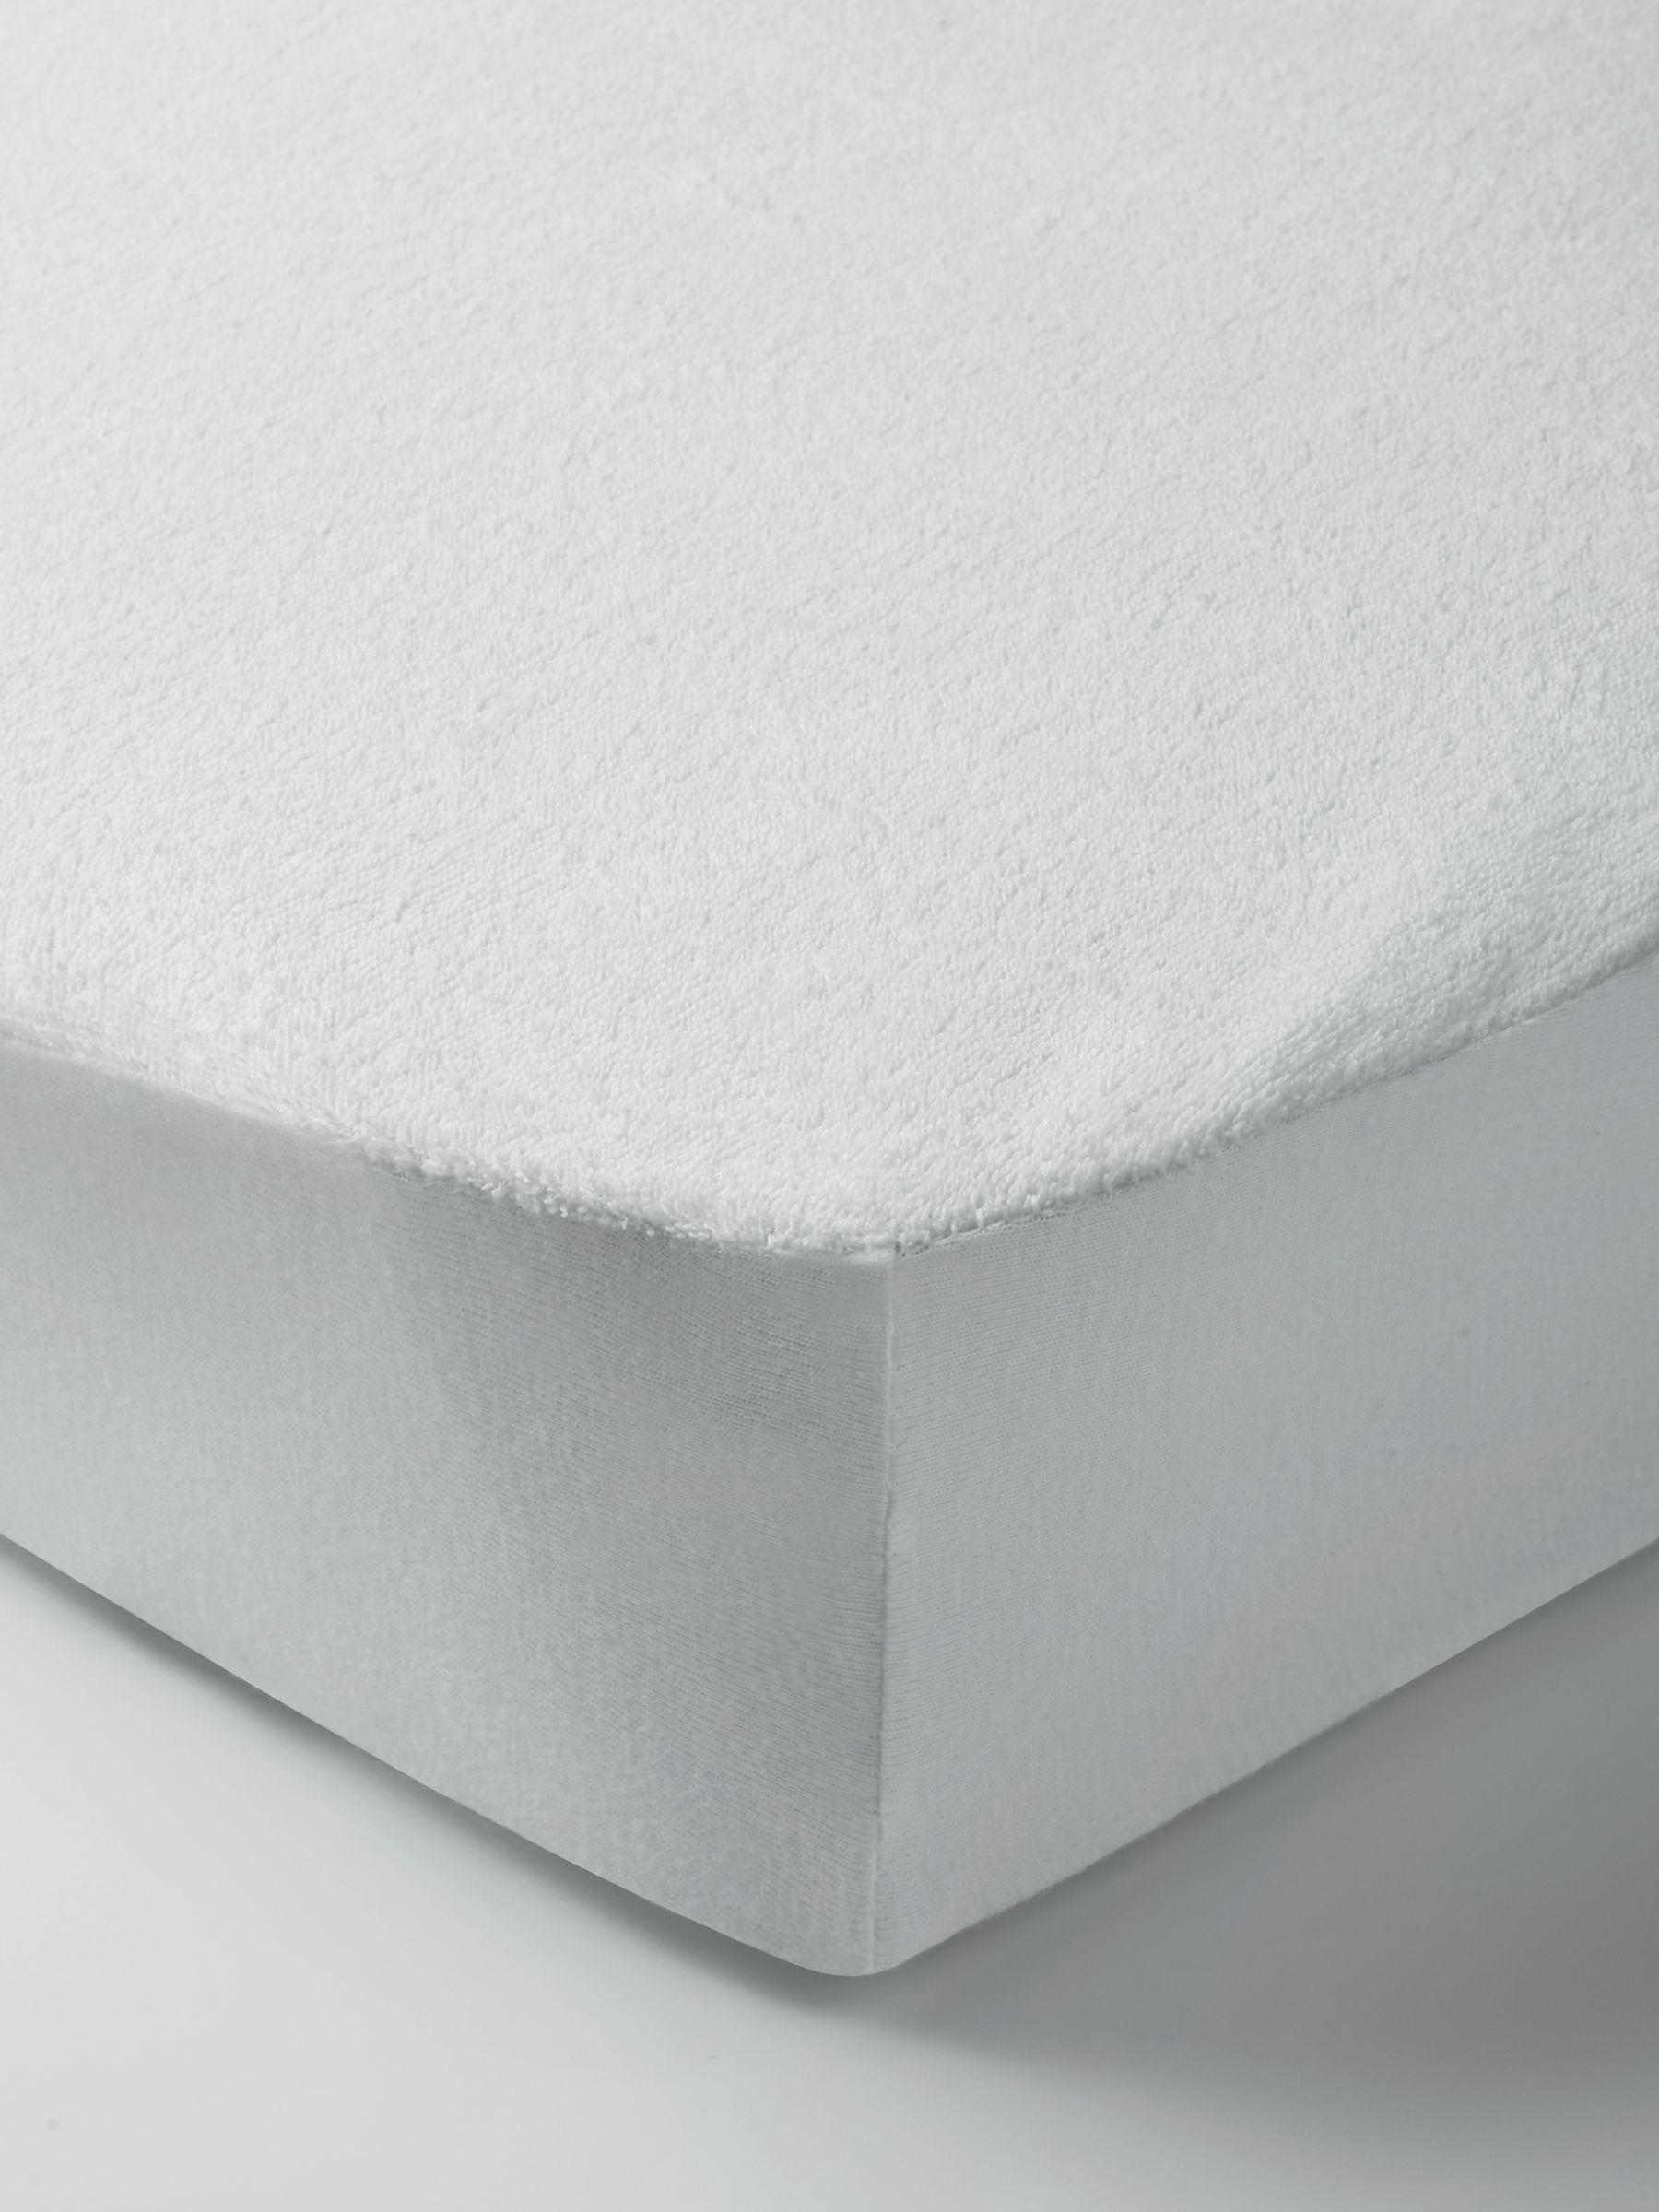 ANYDAY John Lewis & Partners Micro-Fresh Towelling Waterproof Cot Mattress Protector